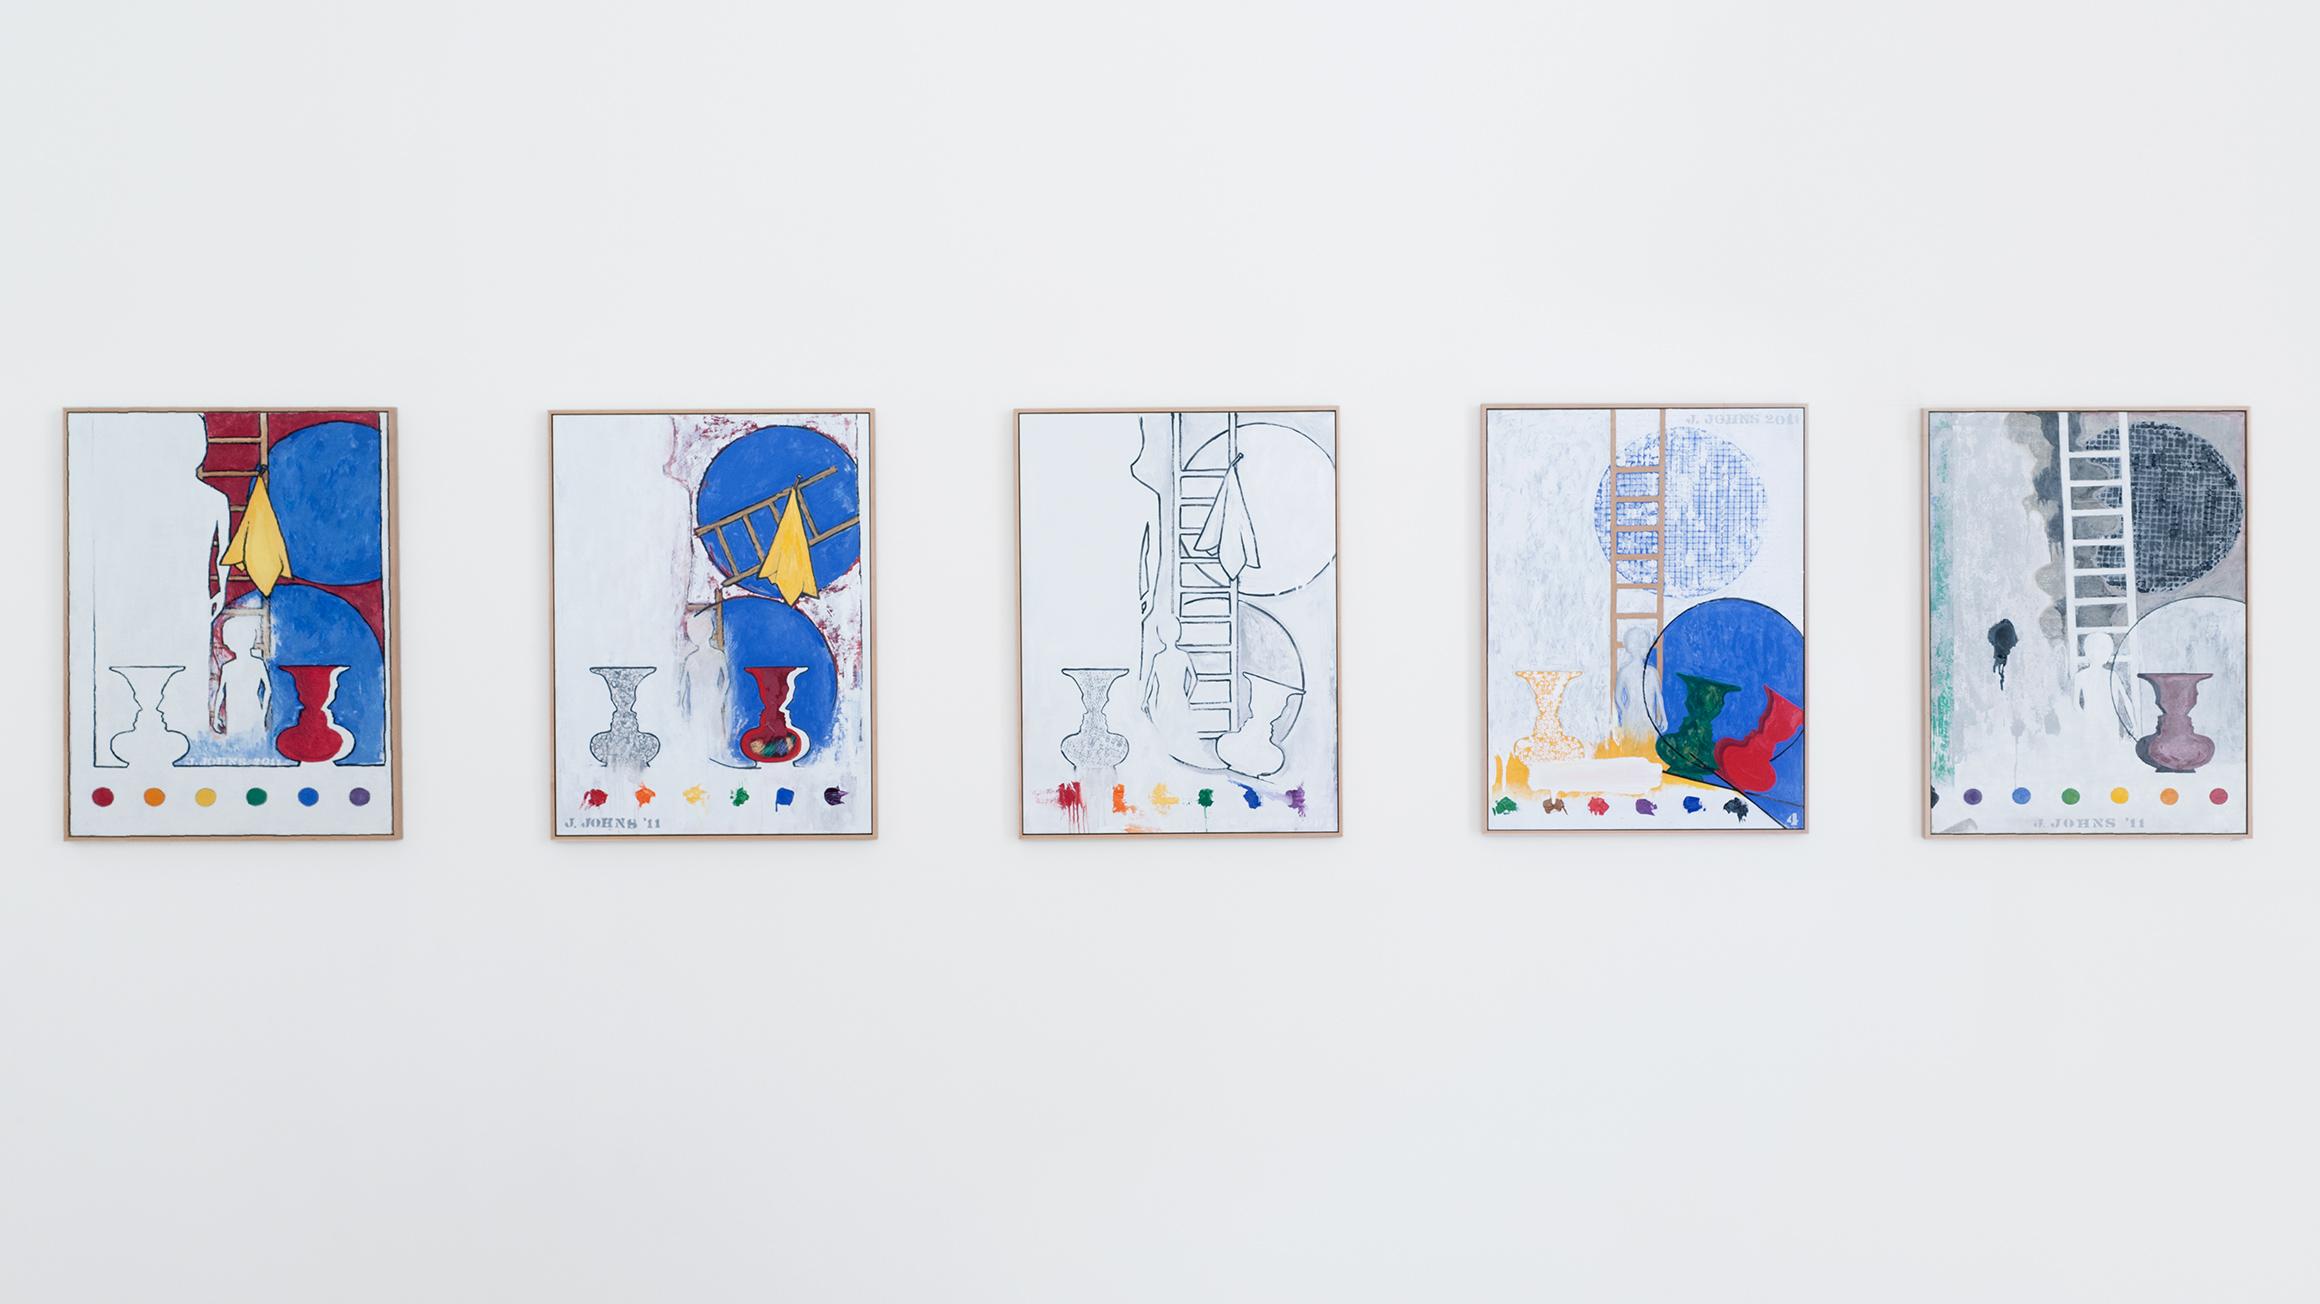 5 Postcards, 2011, by Jasper Johns (American, born 1930), SCC-97a--e. © Jasper Johns/Licensed by VAGA, New York, courtesy of Matthew Marks Gallery